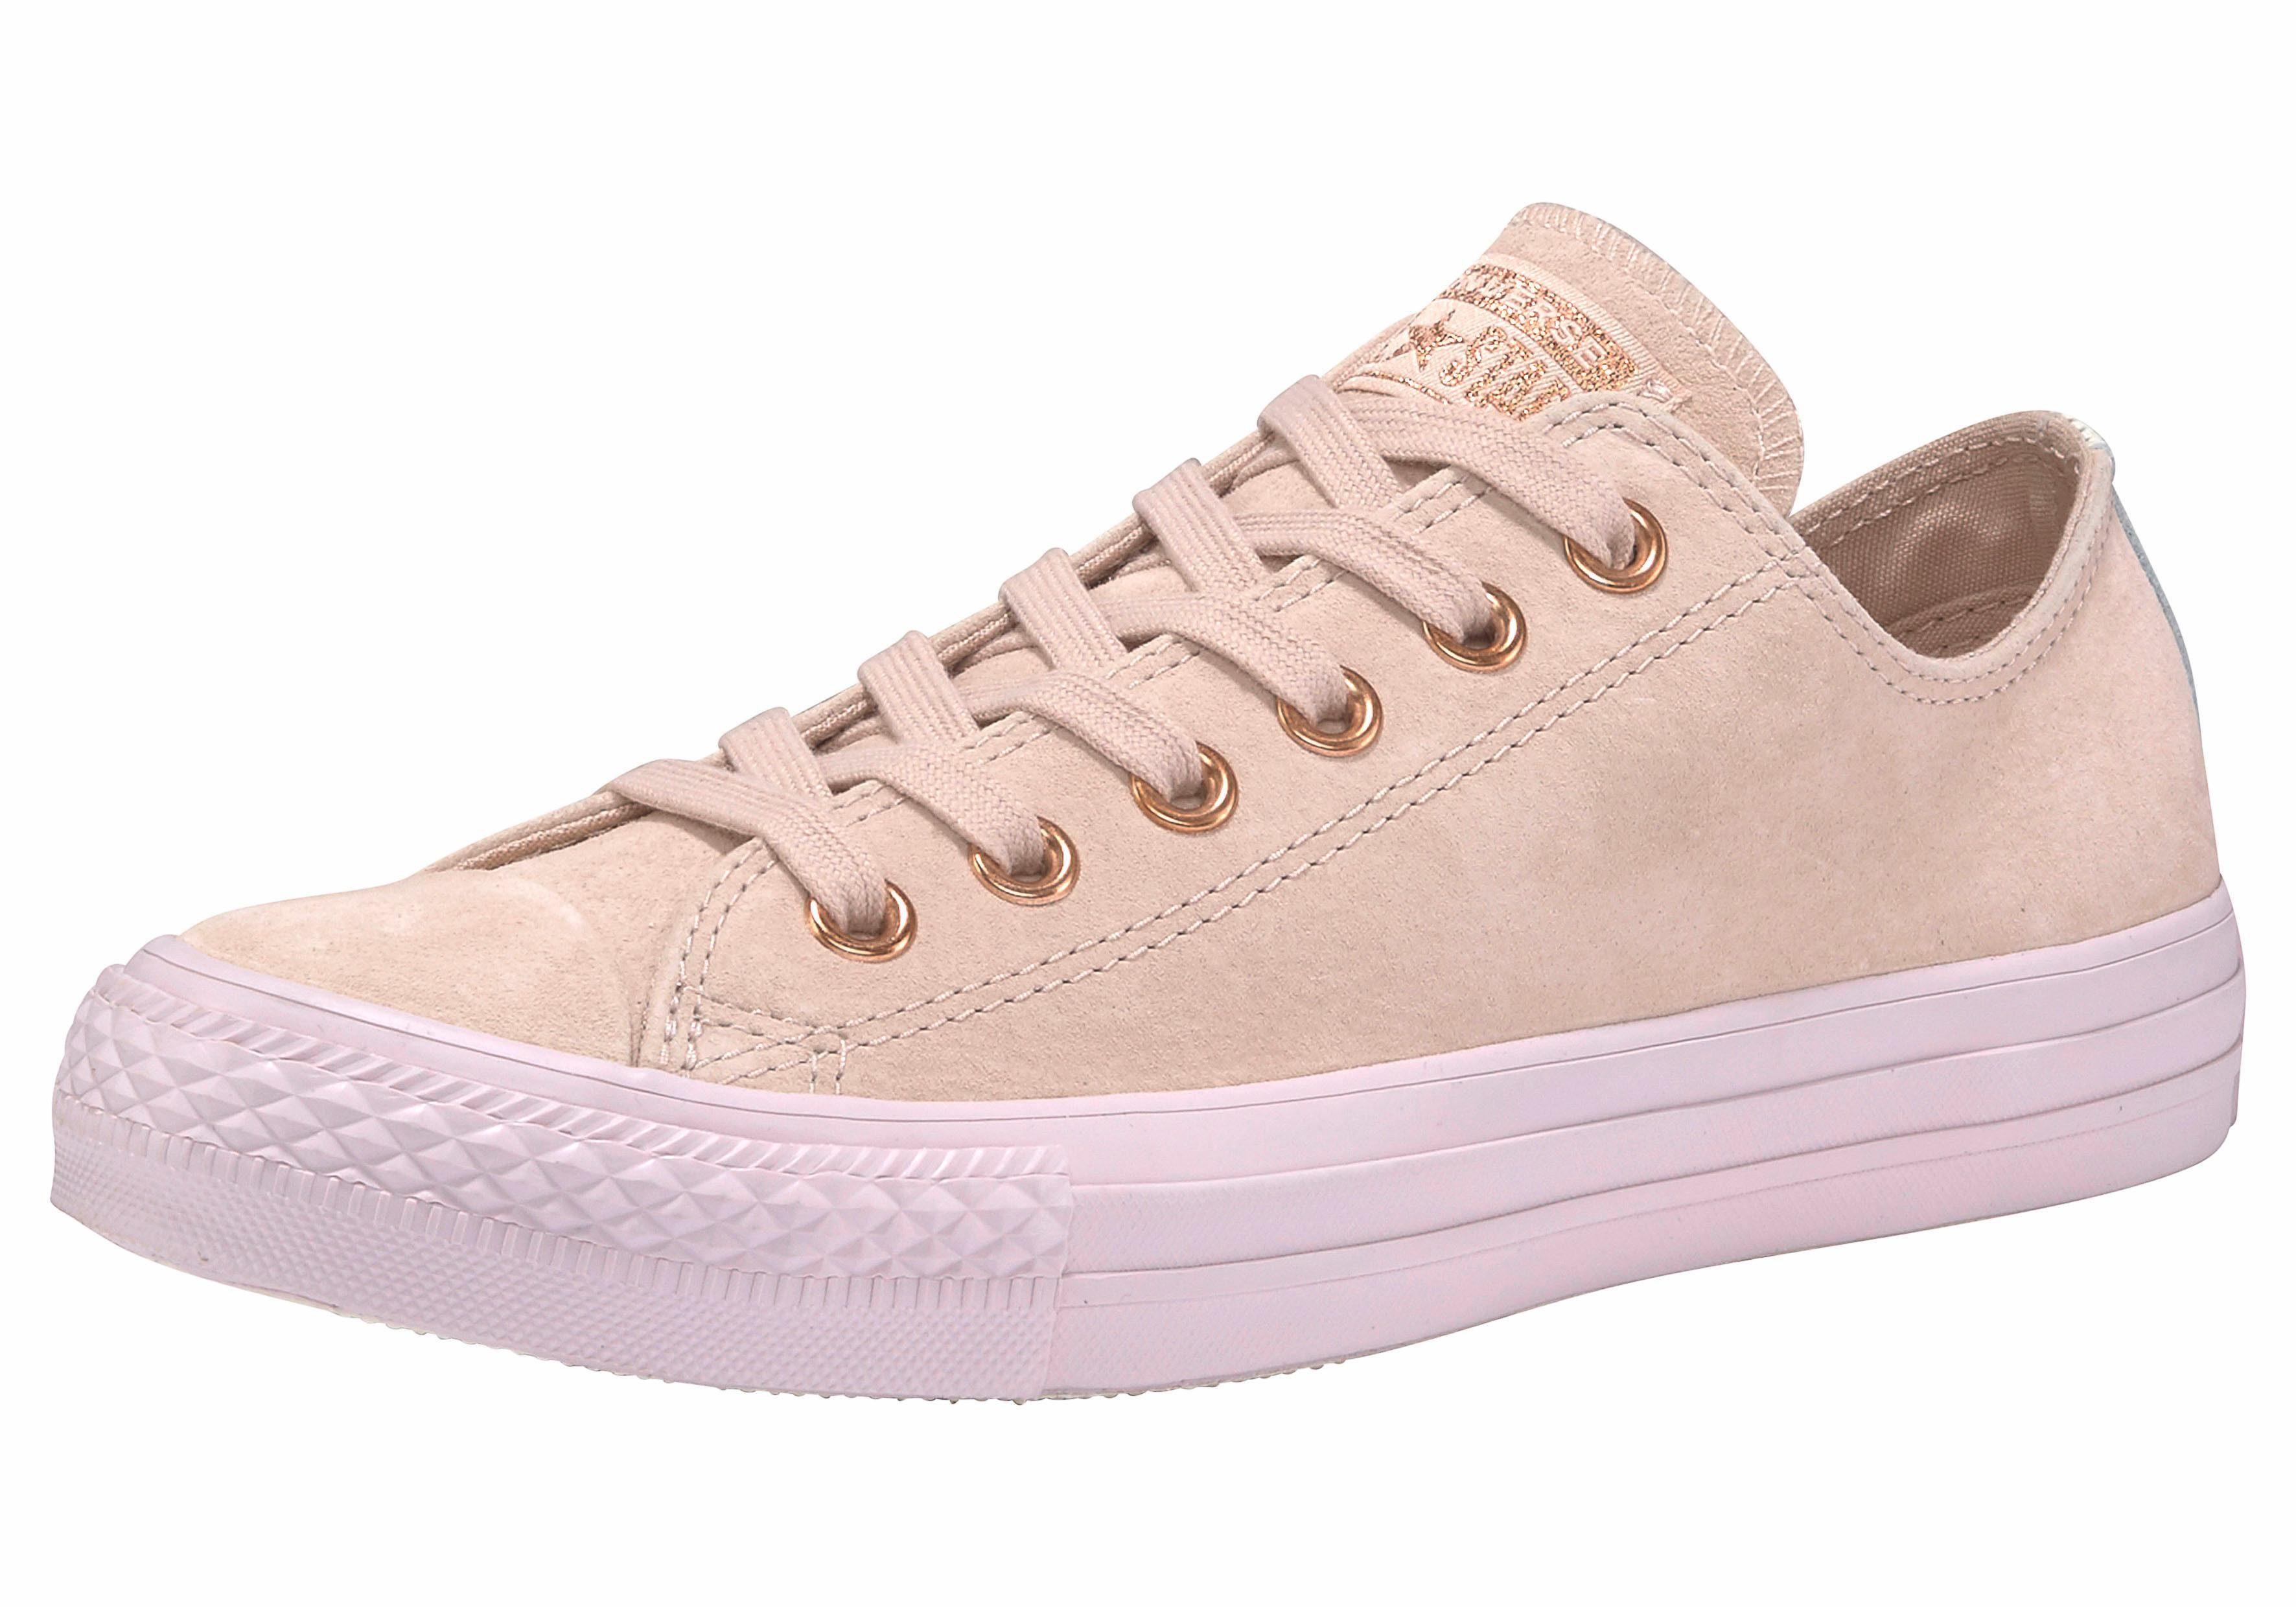 Converse Chuck Taylor All Star Ox Cherrx Blossom Sneaker online kaufen  sand-flieder